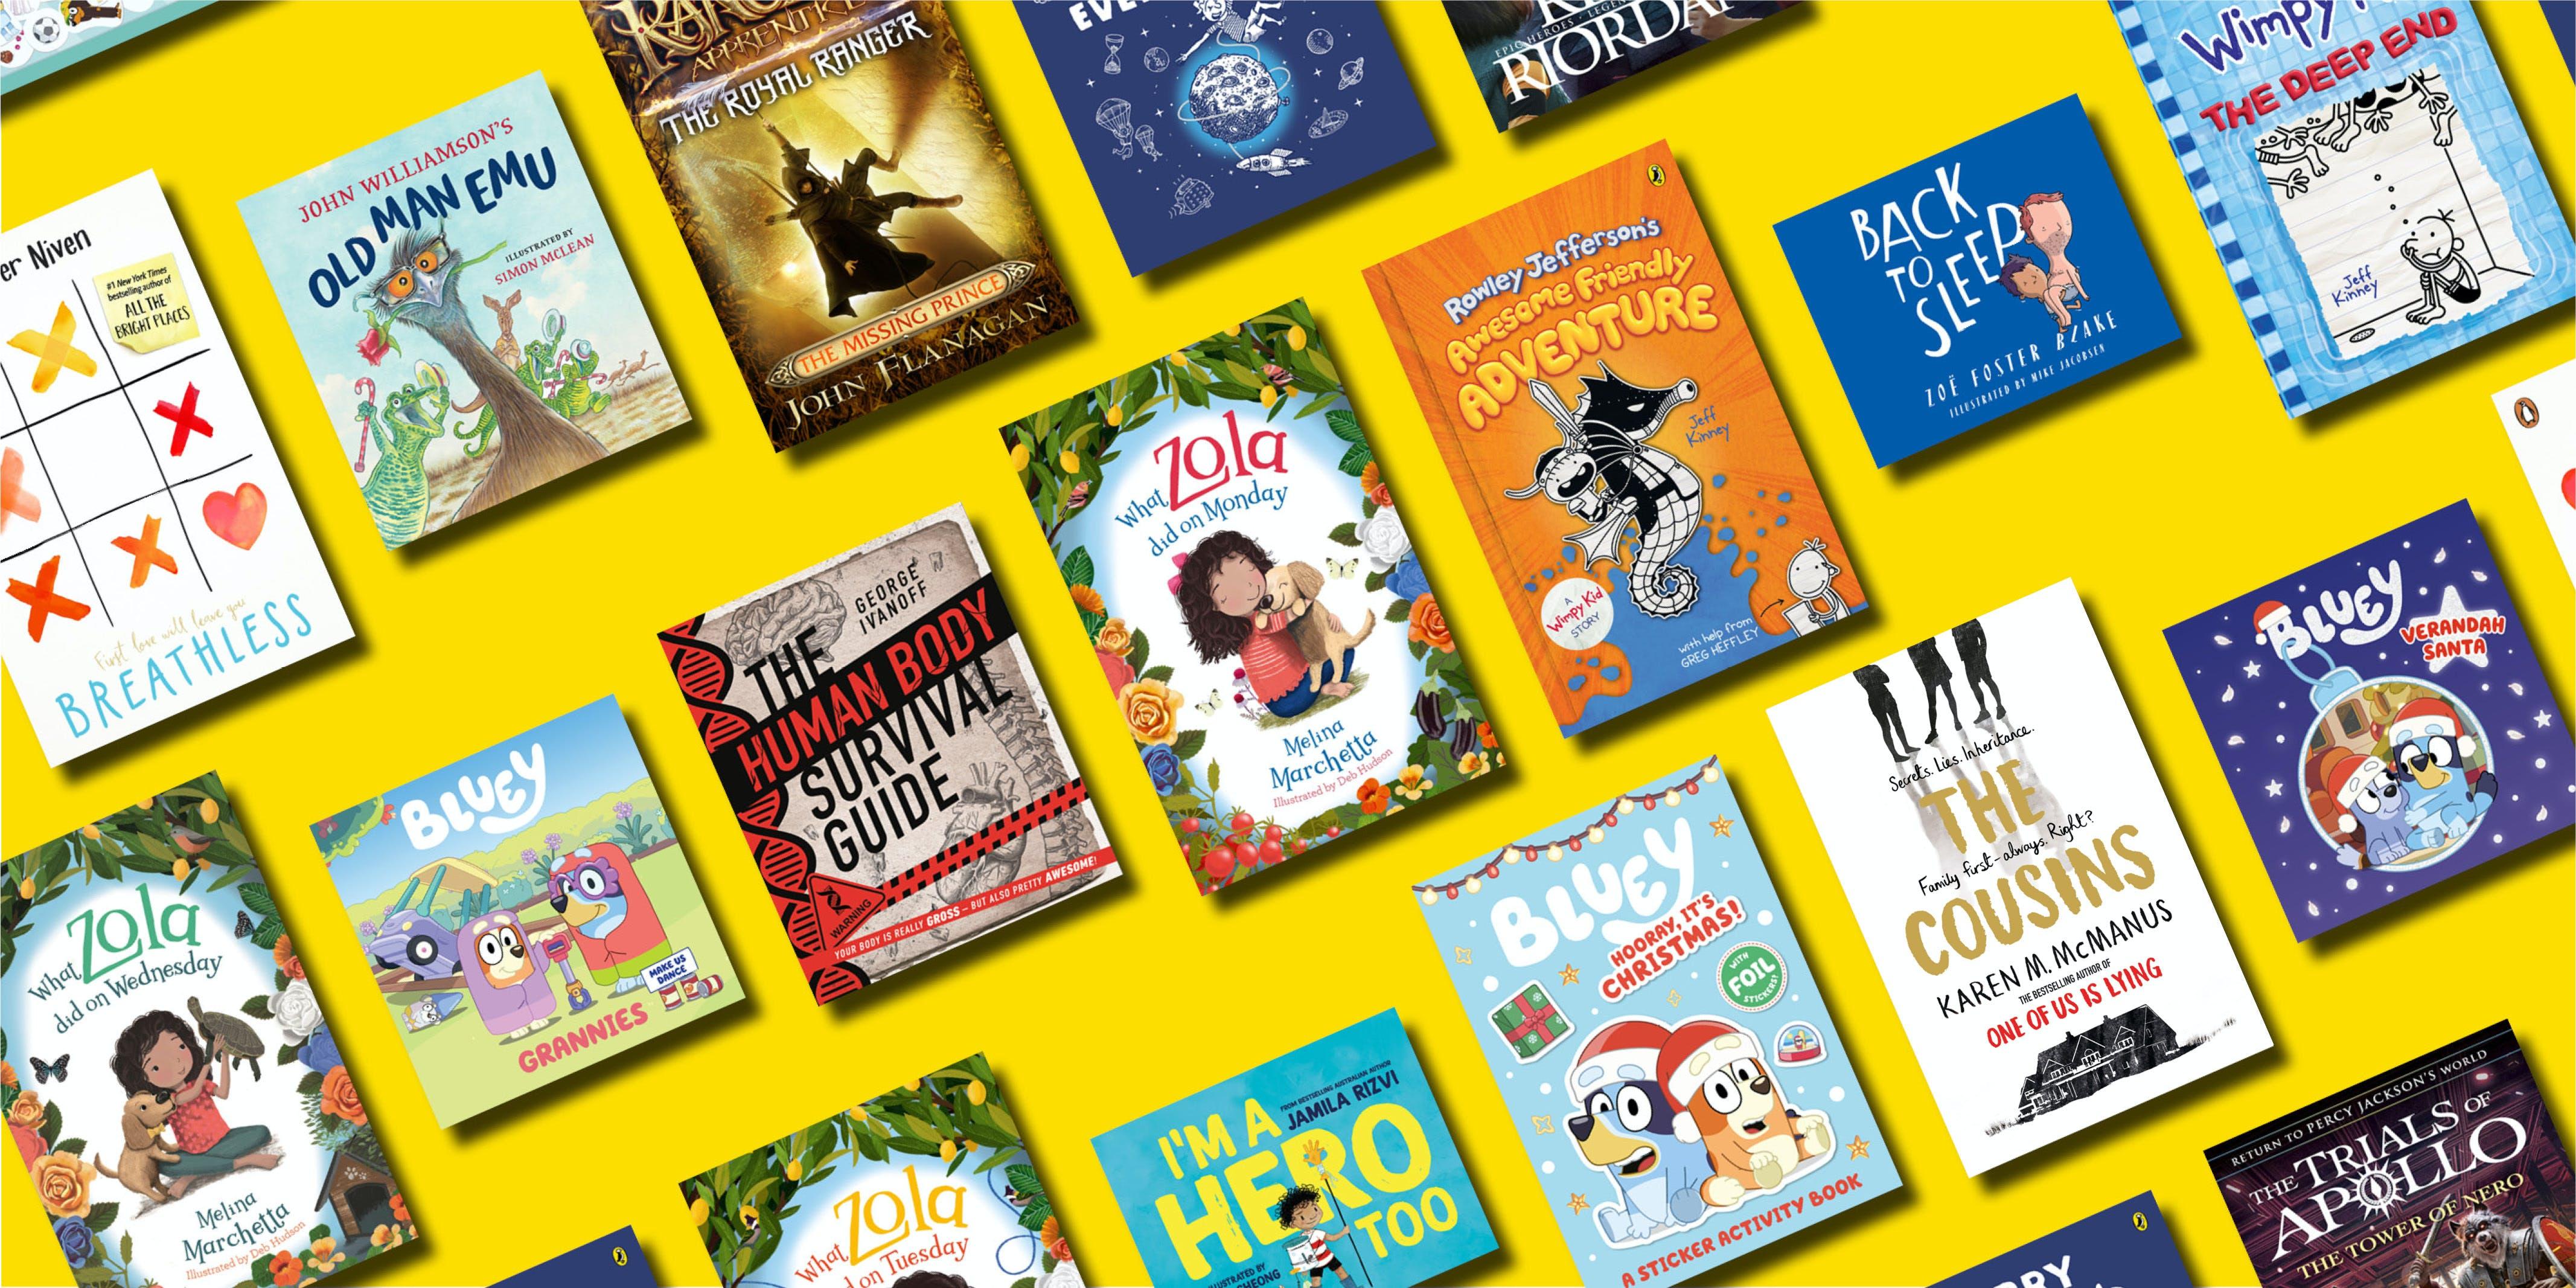 Australia's top 12 kids books for Christmas 2020